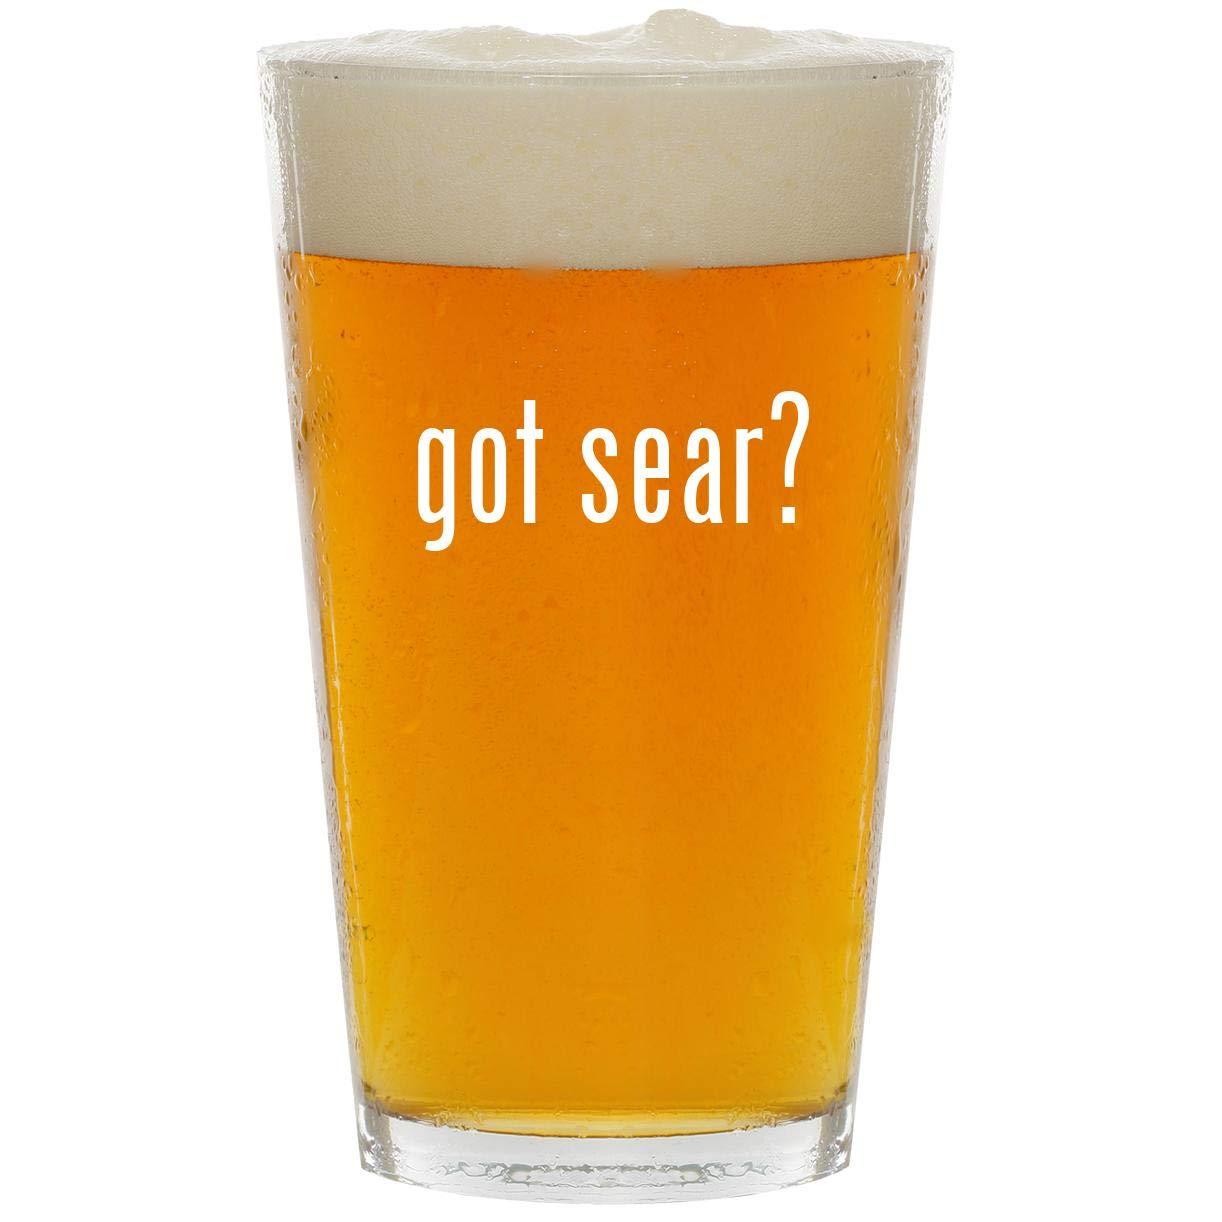 got sear? - Glass 16oz Beer Pint